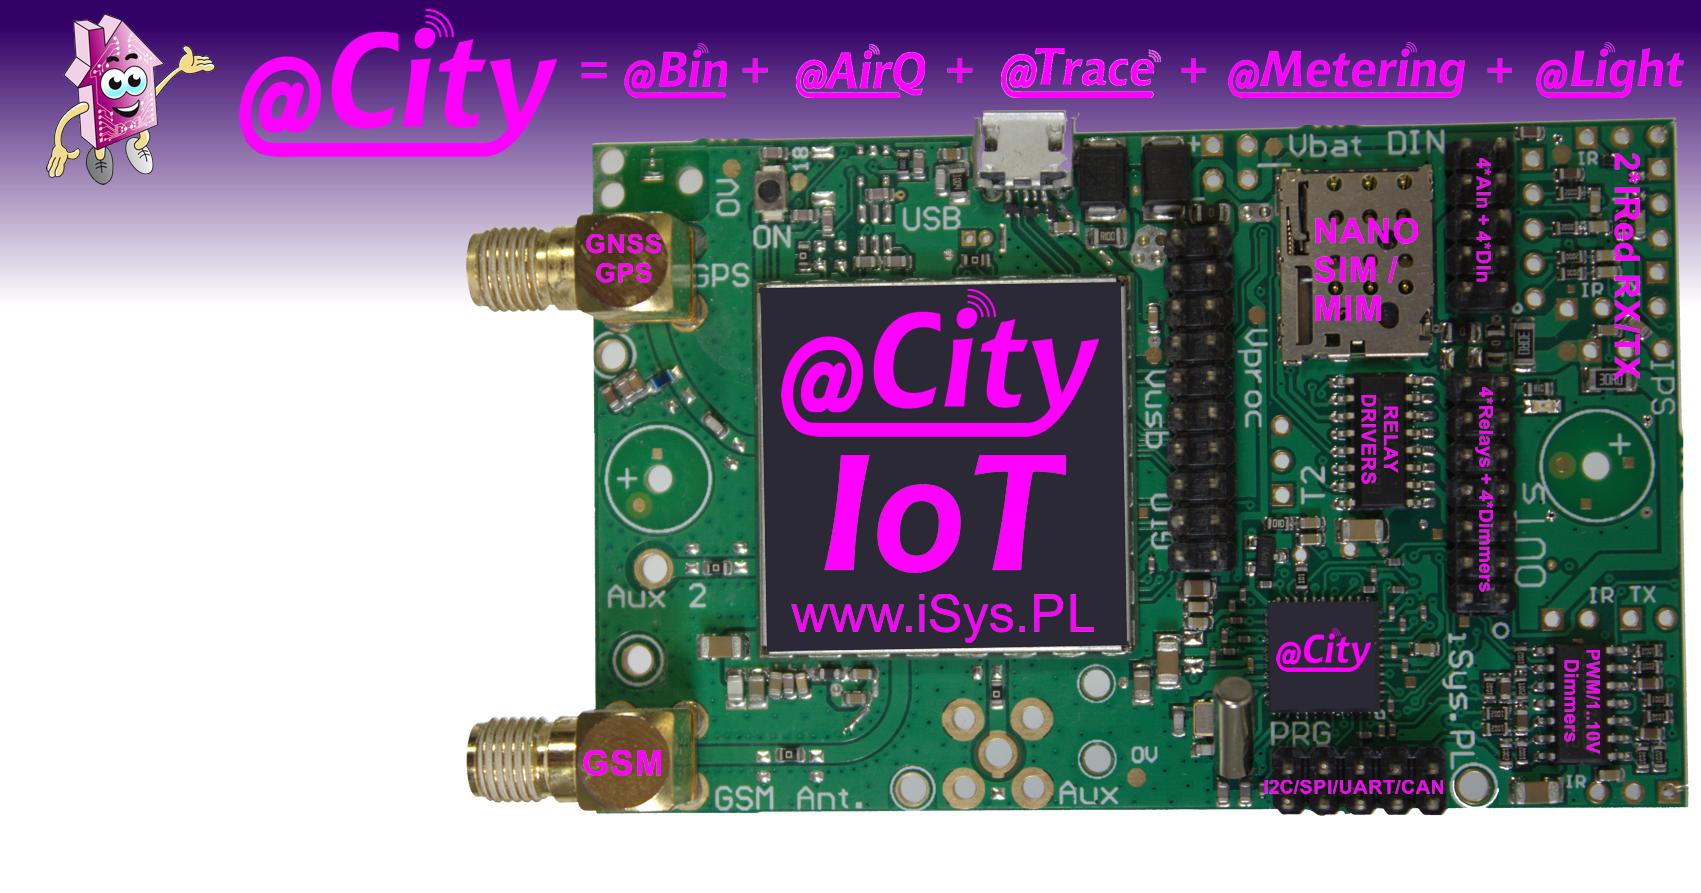 IIoT/IoT GSM/2G/3G/4G/CATM1/NBIoT + GPS/GNSS - Sterownik Smart City/Light/Smart Metering